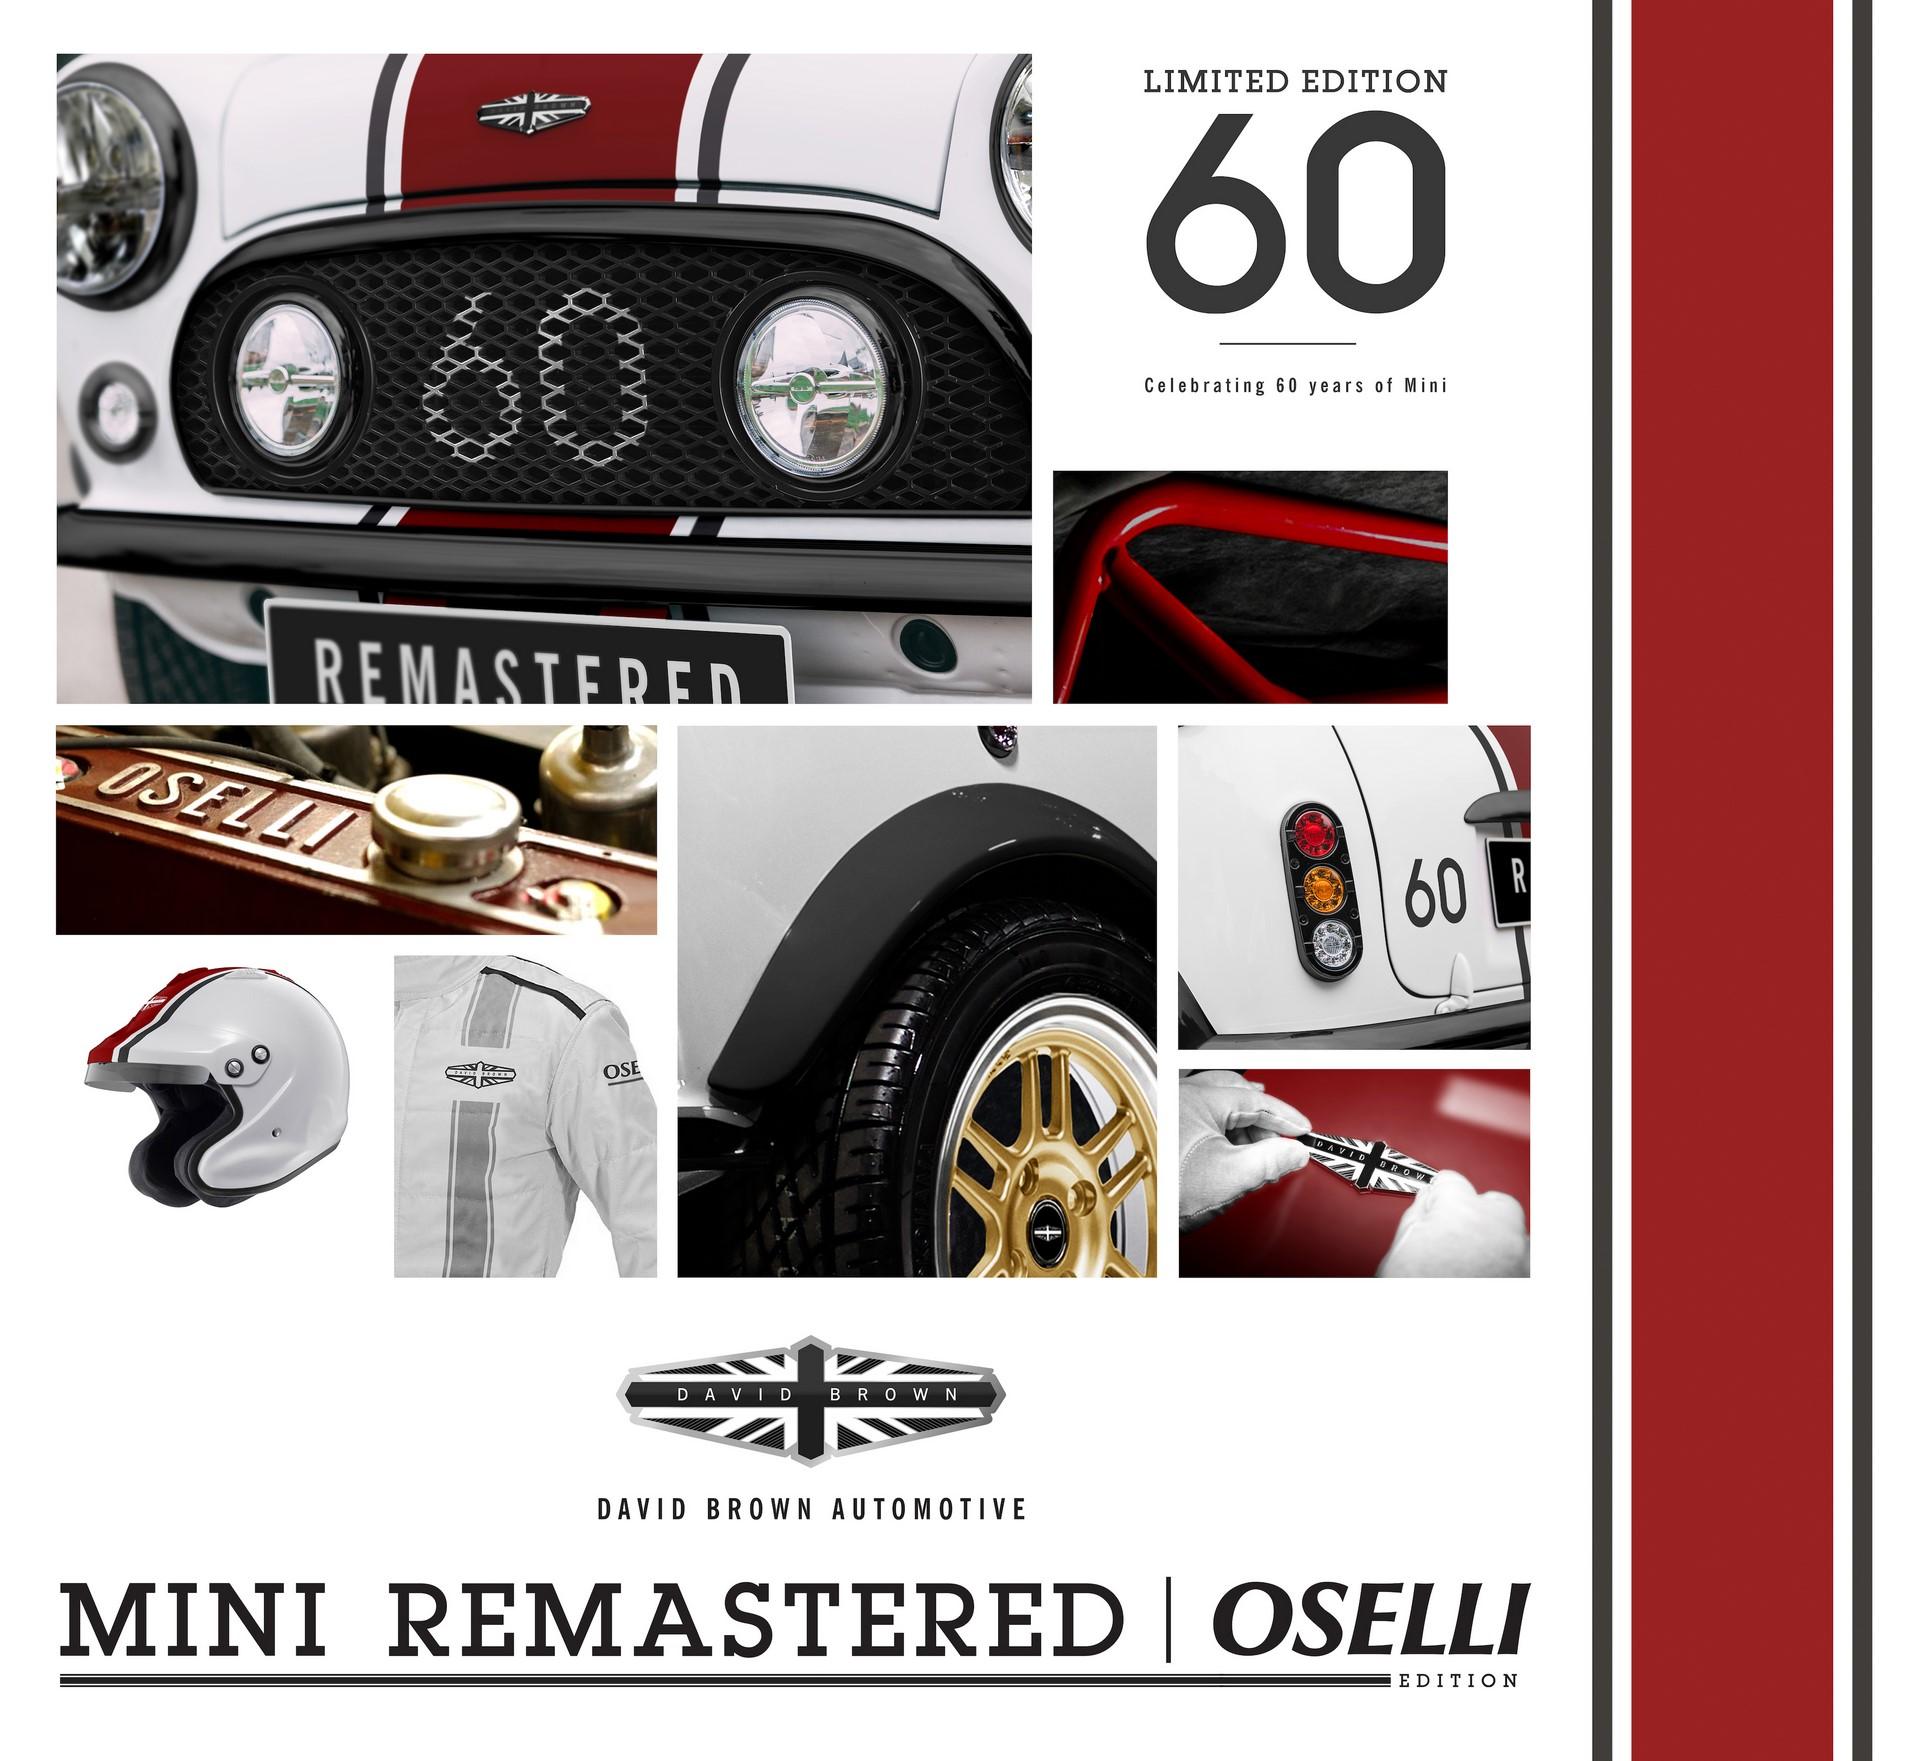 Mini-Remastered-Oselli-Edition-4